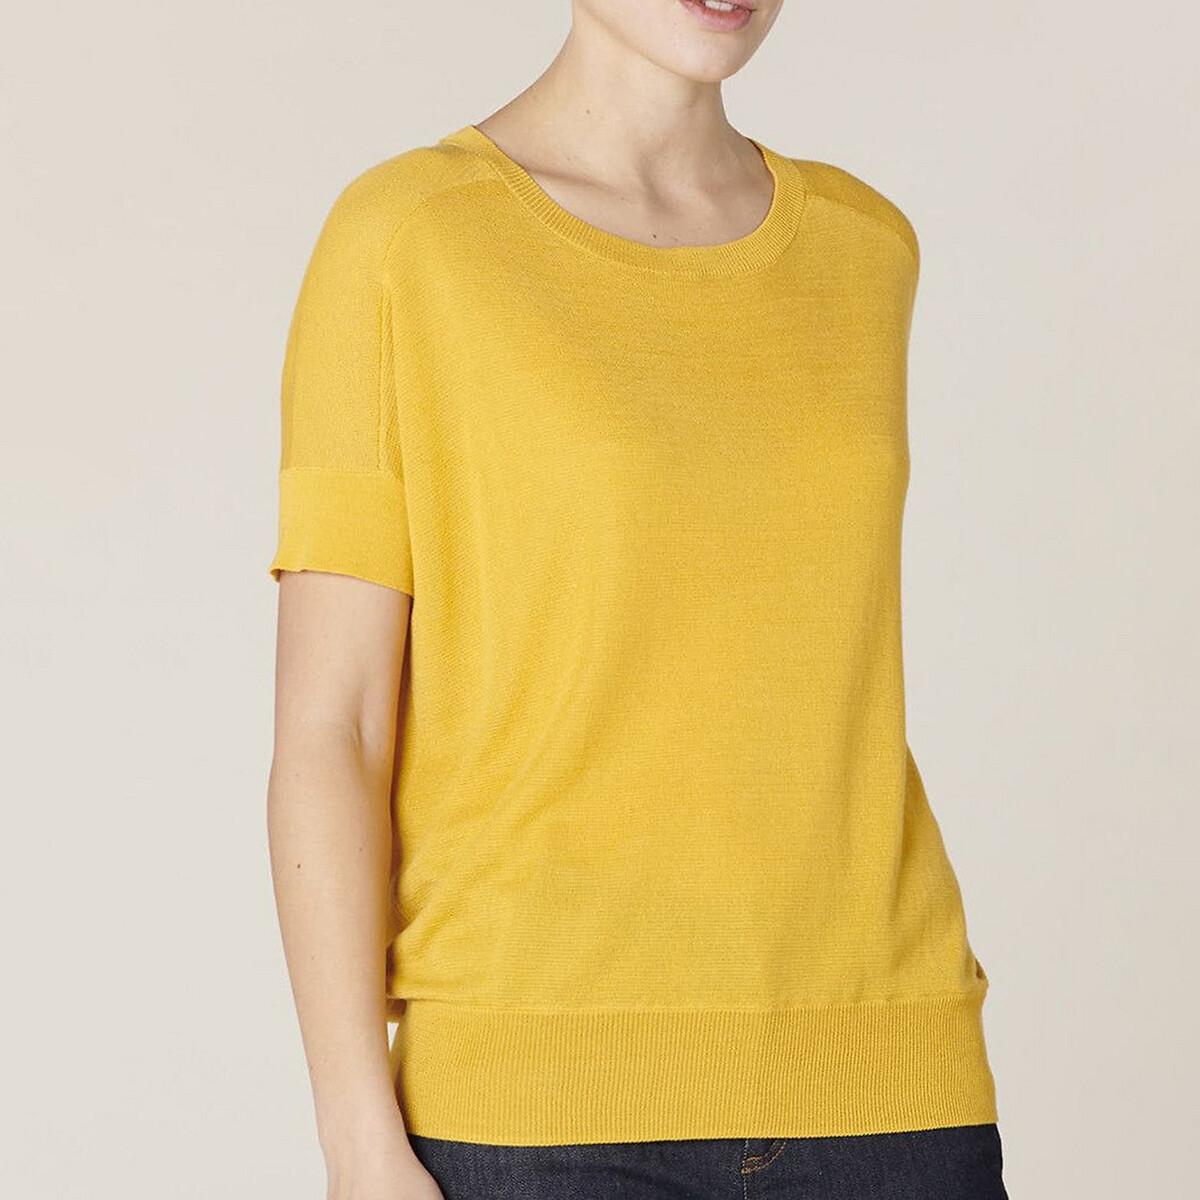 Пуловер La Redoute С круглым вырезом из тонкого трикотажа FLAURINE 2(M) желтый пуловер la redoute с круглым вырезом из тонкого трикотажа m красный